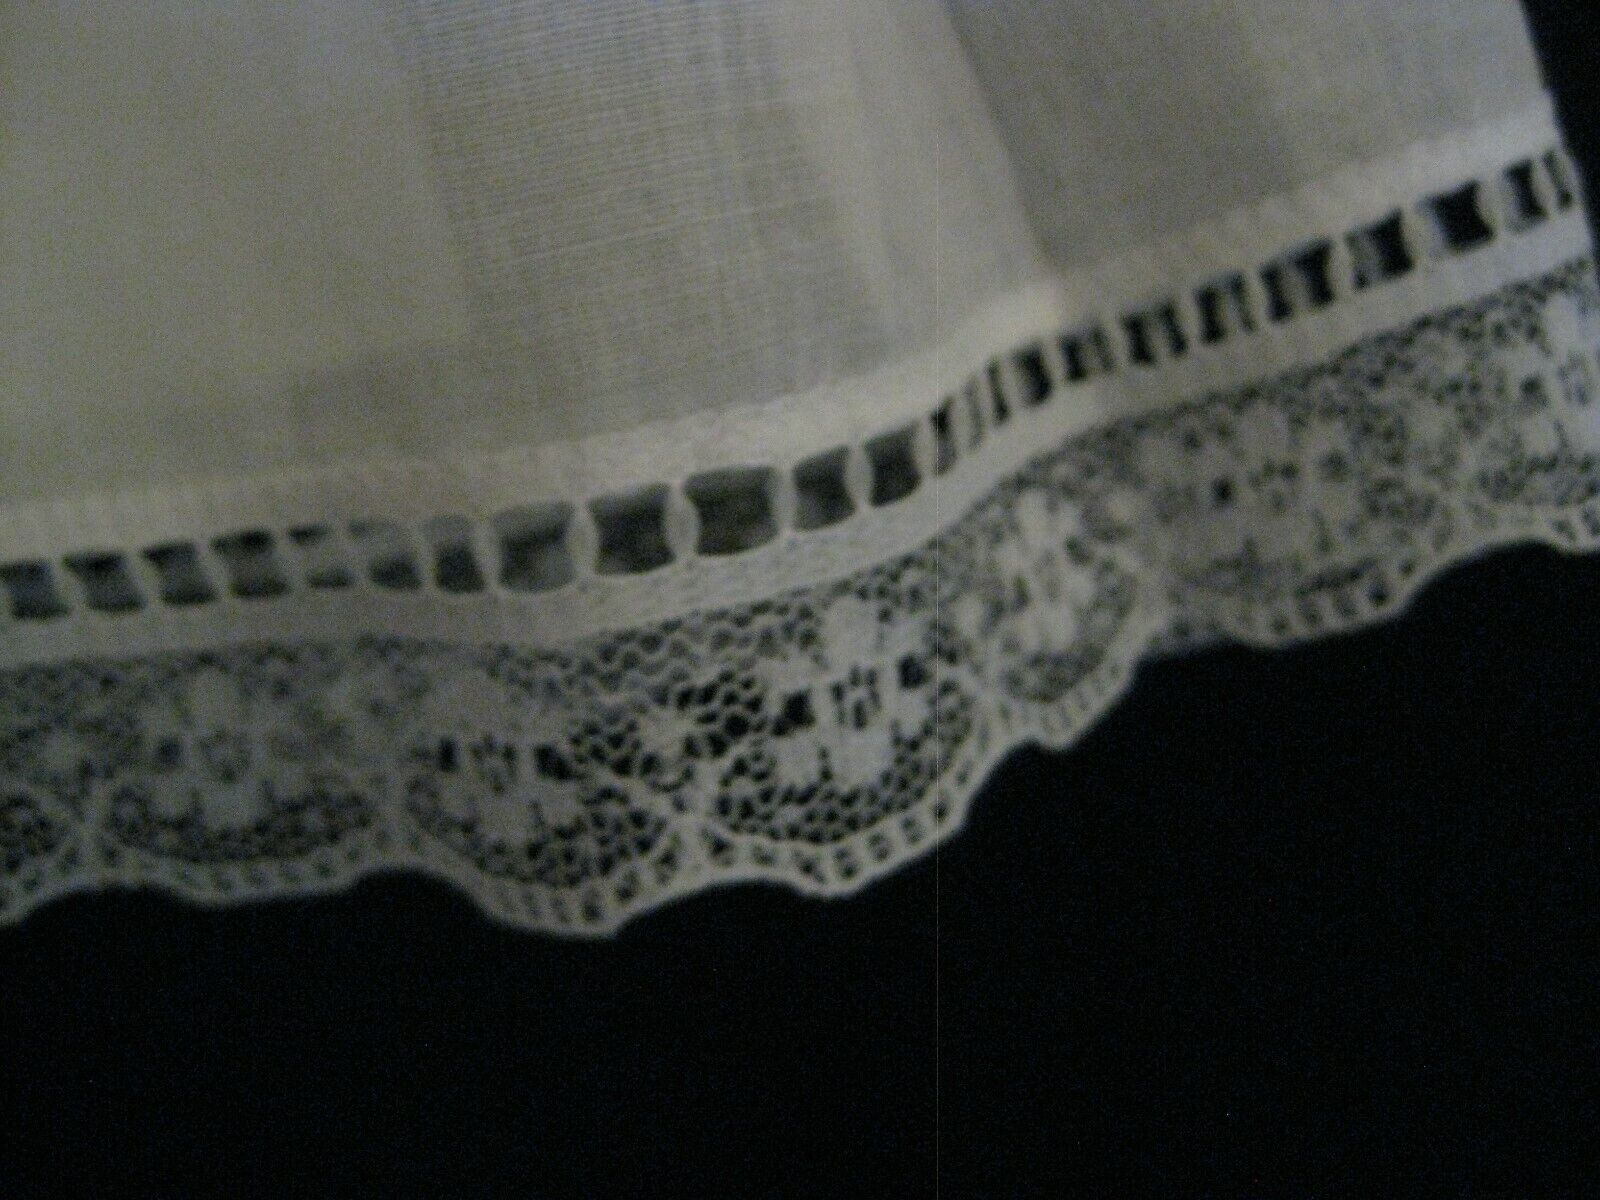 Gunne Sax White Dress Girls Size 12 Pre-Owned - image 10